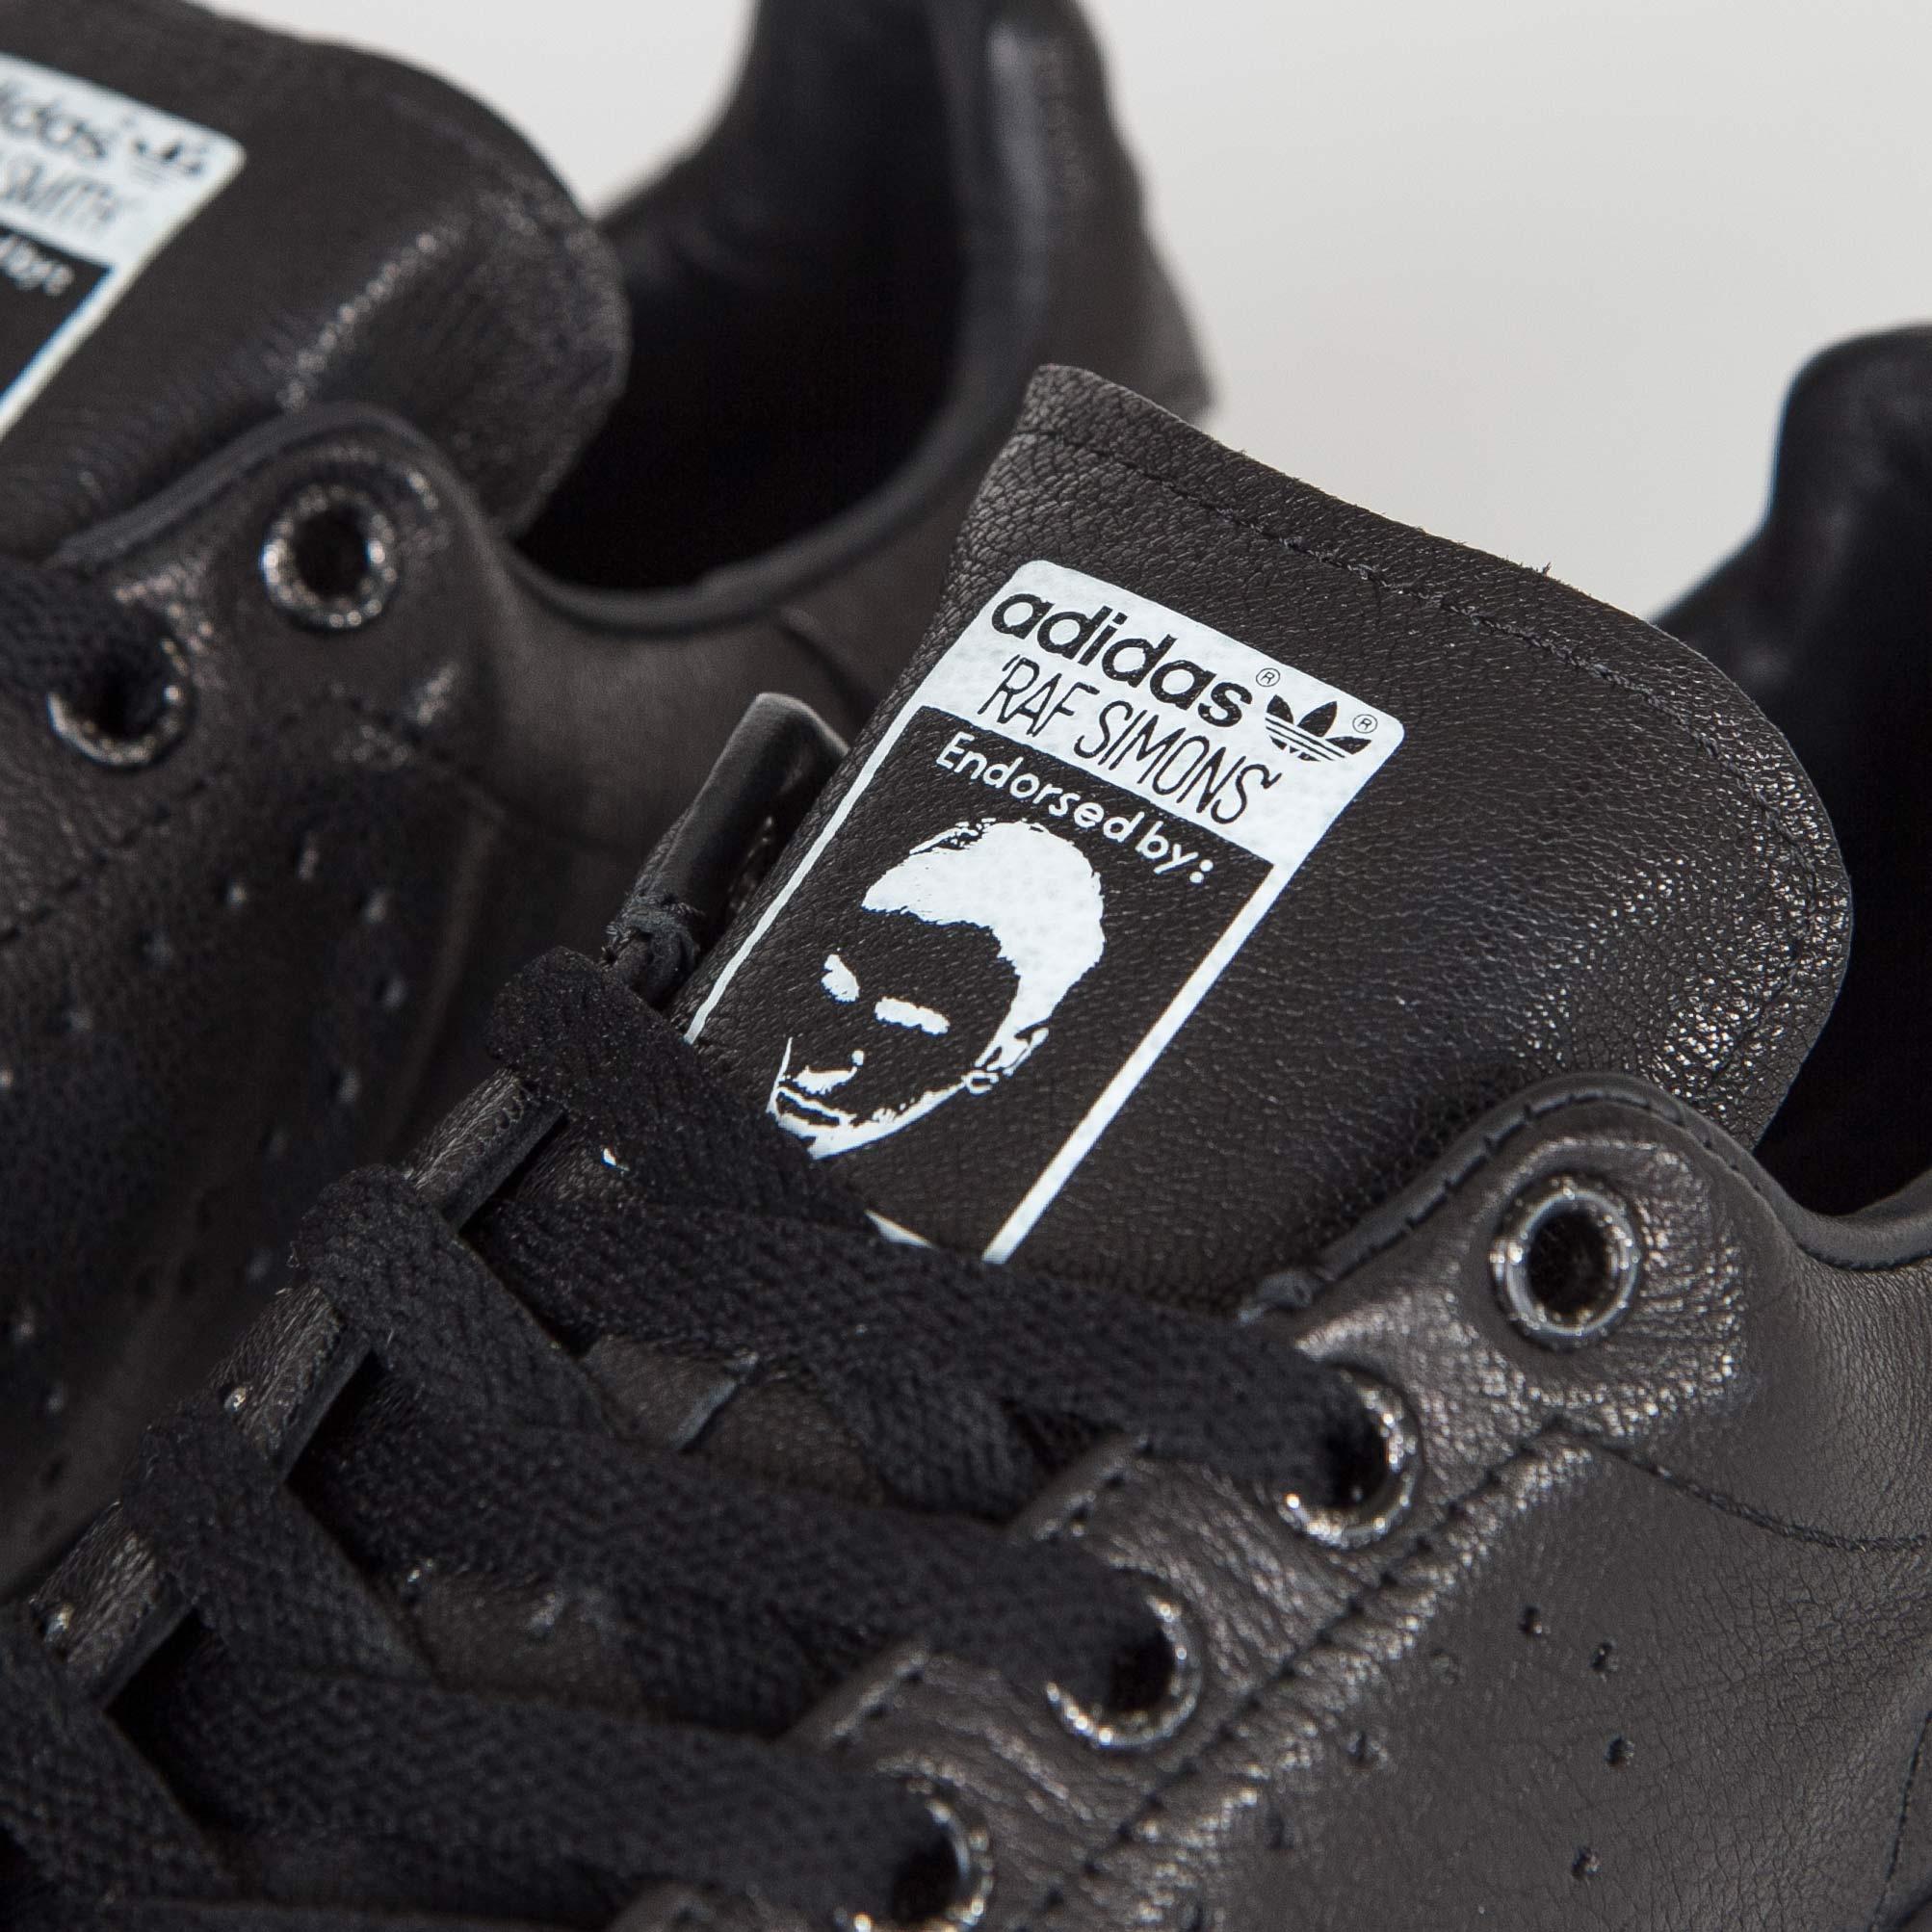 5d0c9cf7bdedda adidas Raf Simons Stan Smith Aged - S74620 - Sneakersnstuff ...